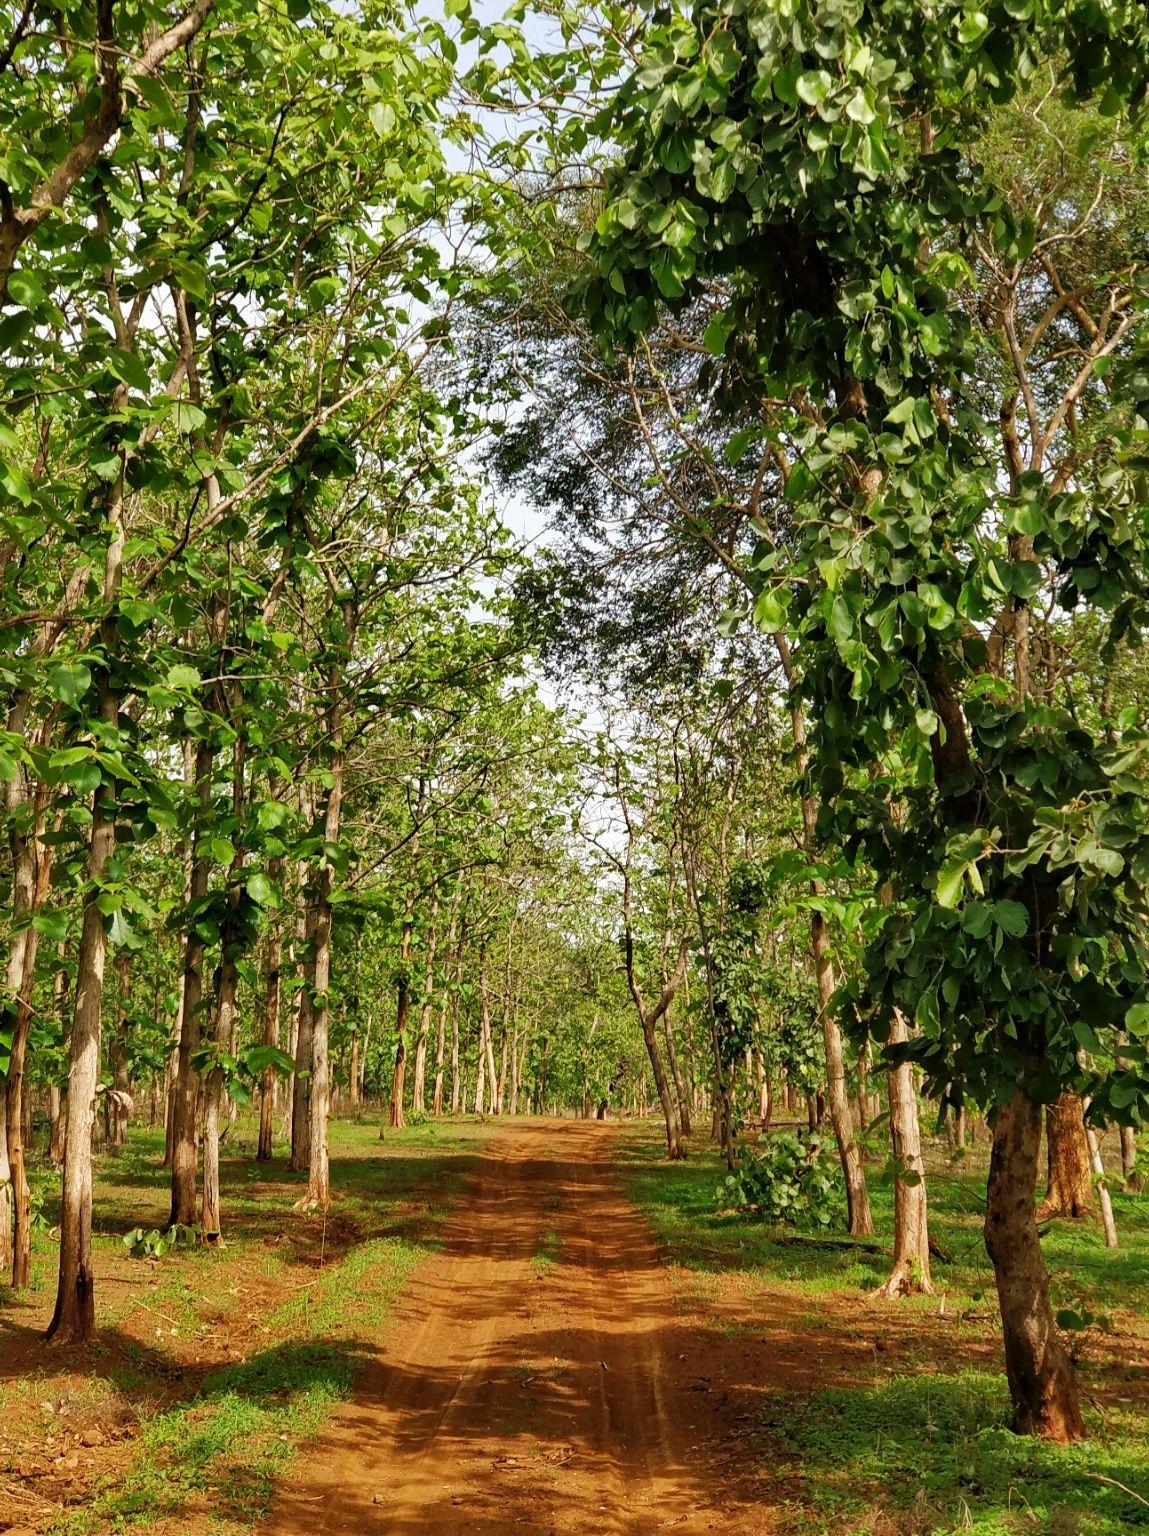 Photo of Tipeshwar Wildlife Sanctuary By vimal chavda